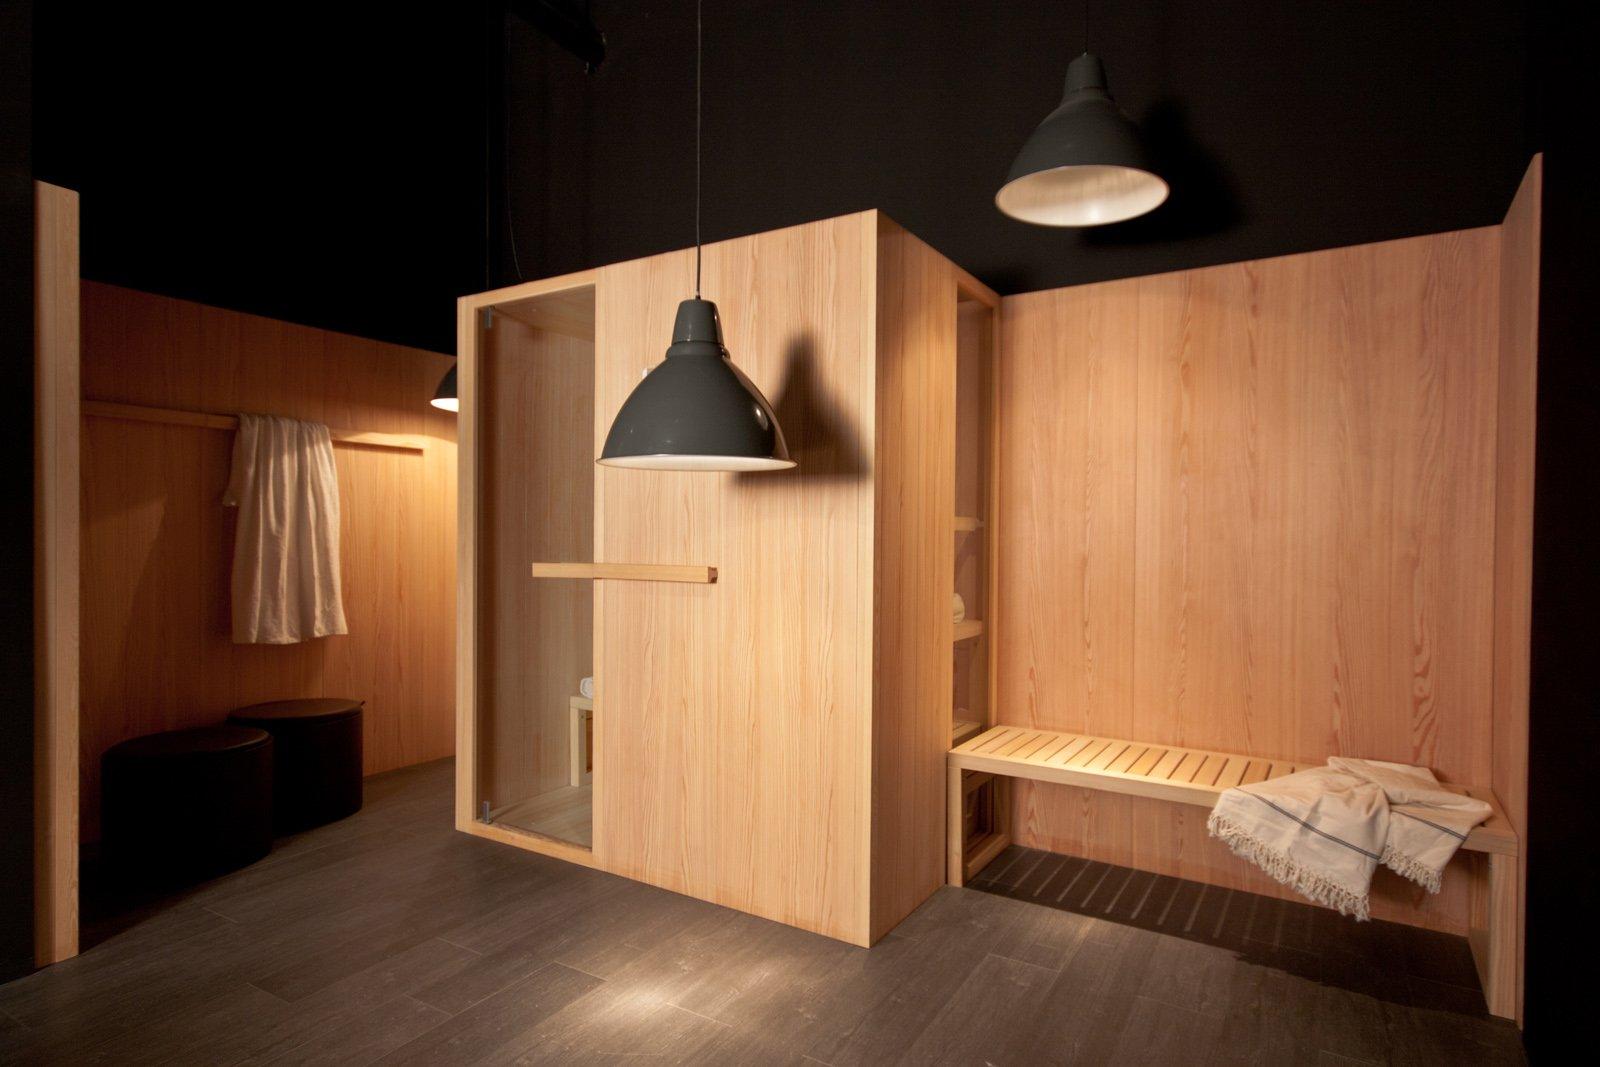 Sauna in casa, che benessere - Cose di Casa